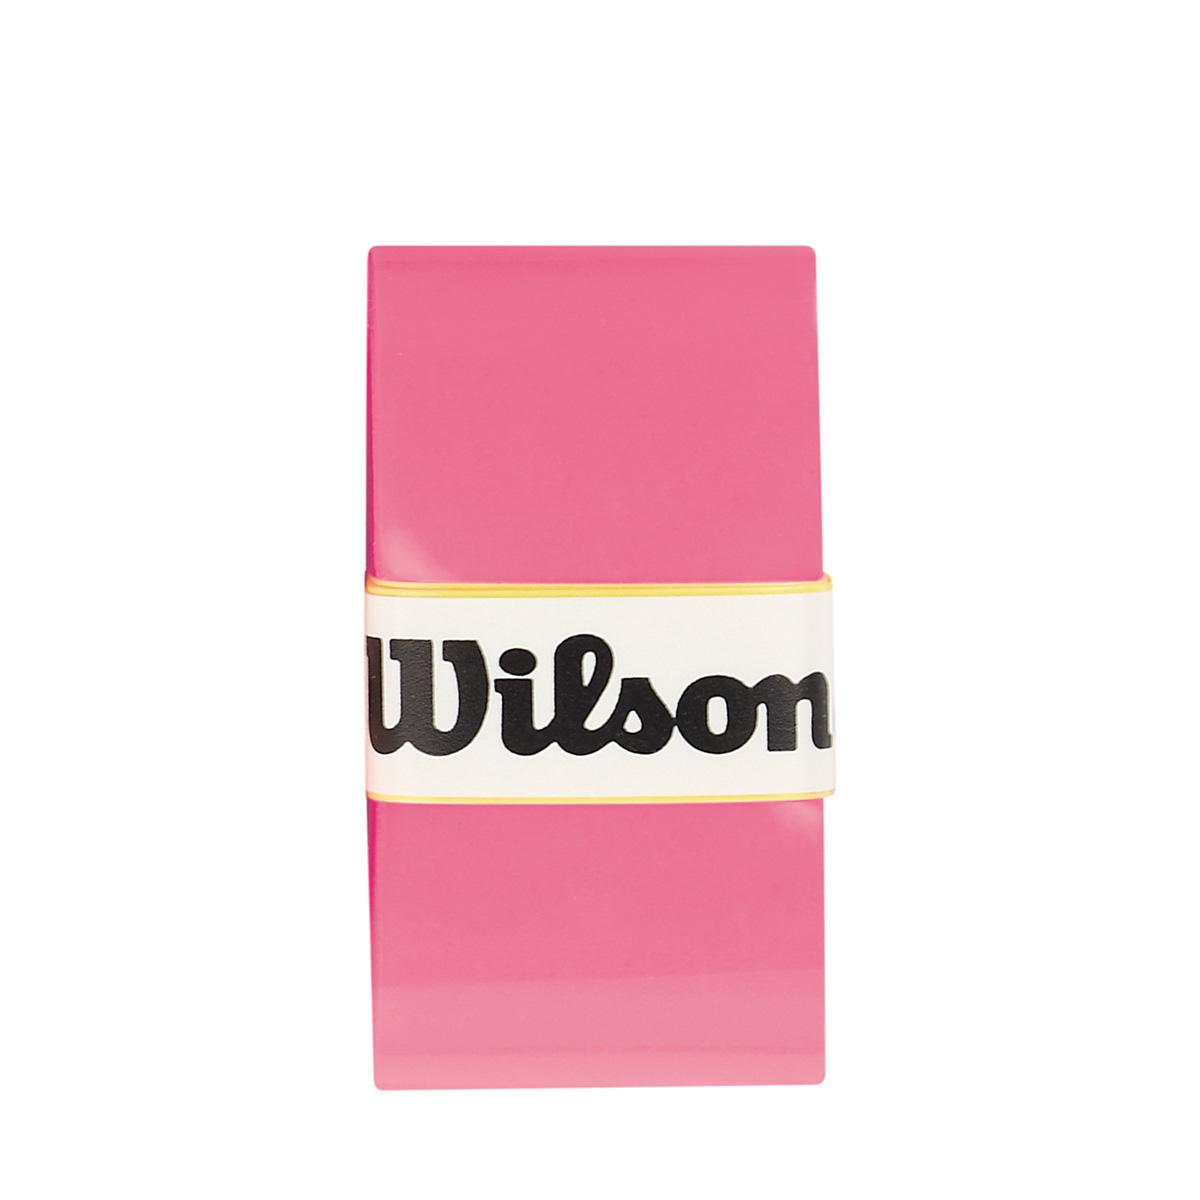 WRZ4014PK_2_Pro_Overgrip_Pink_single